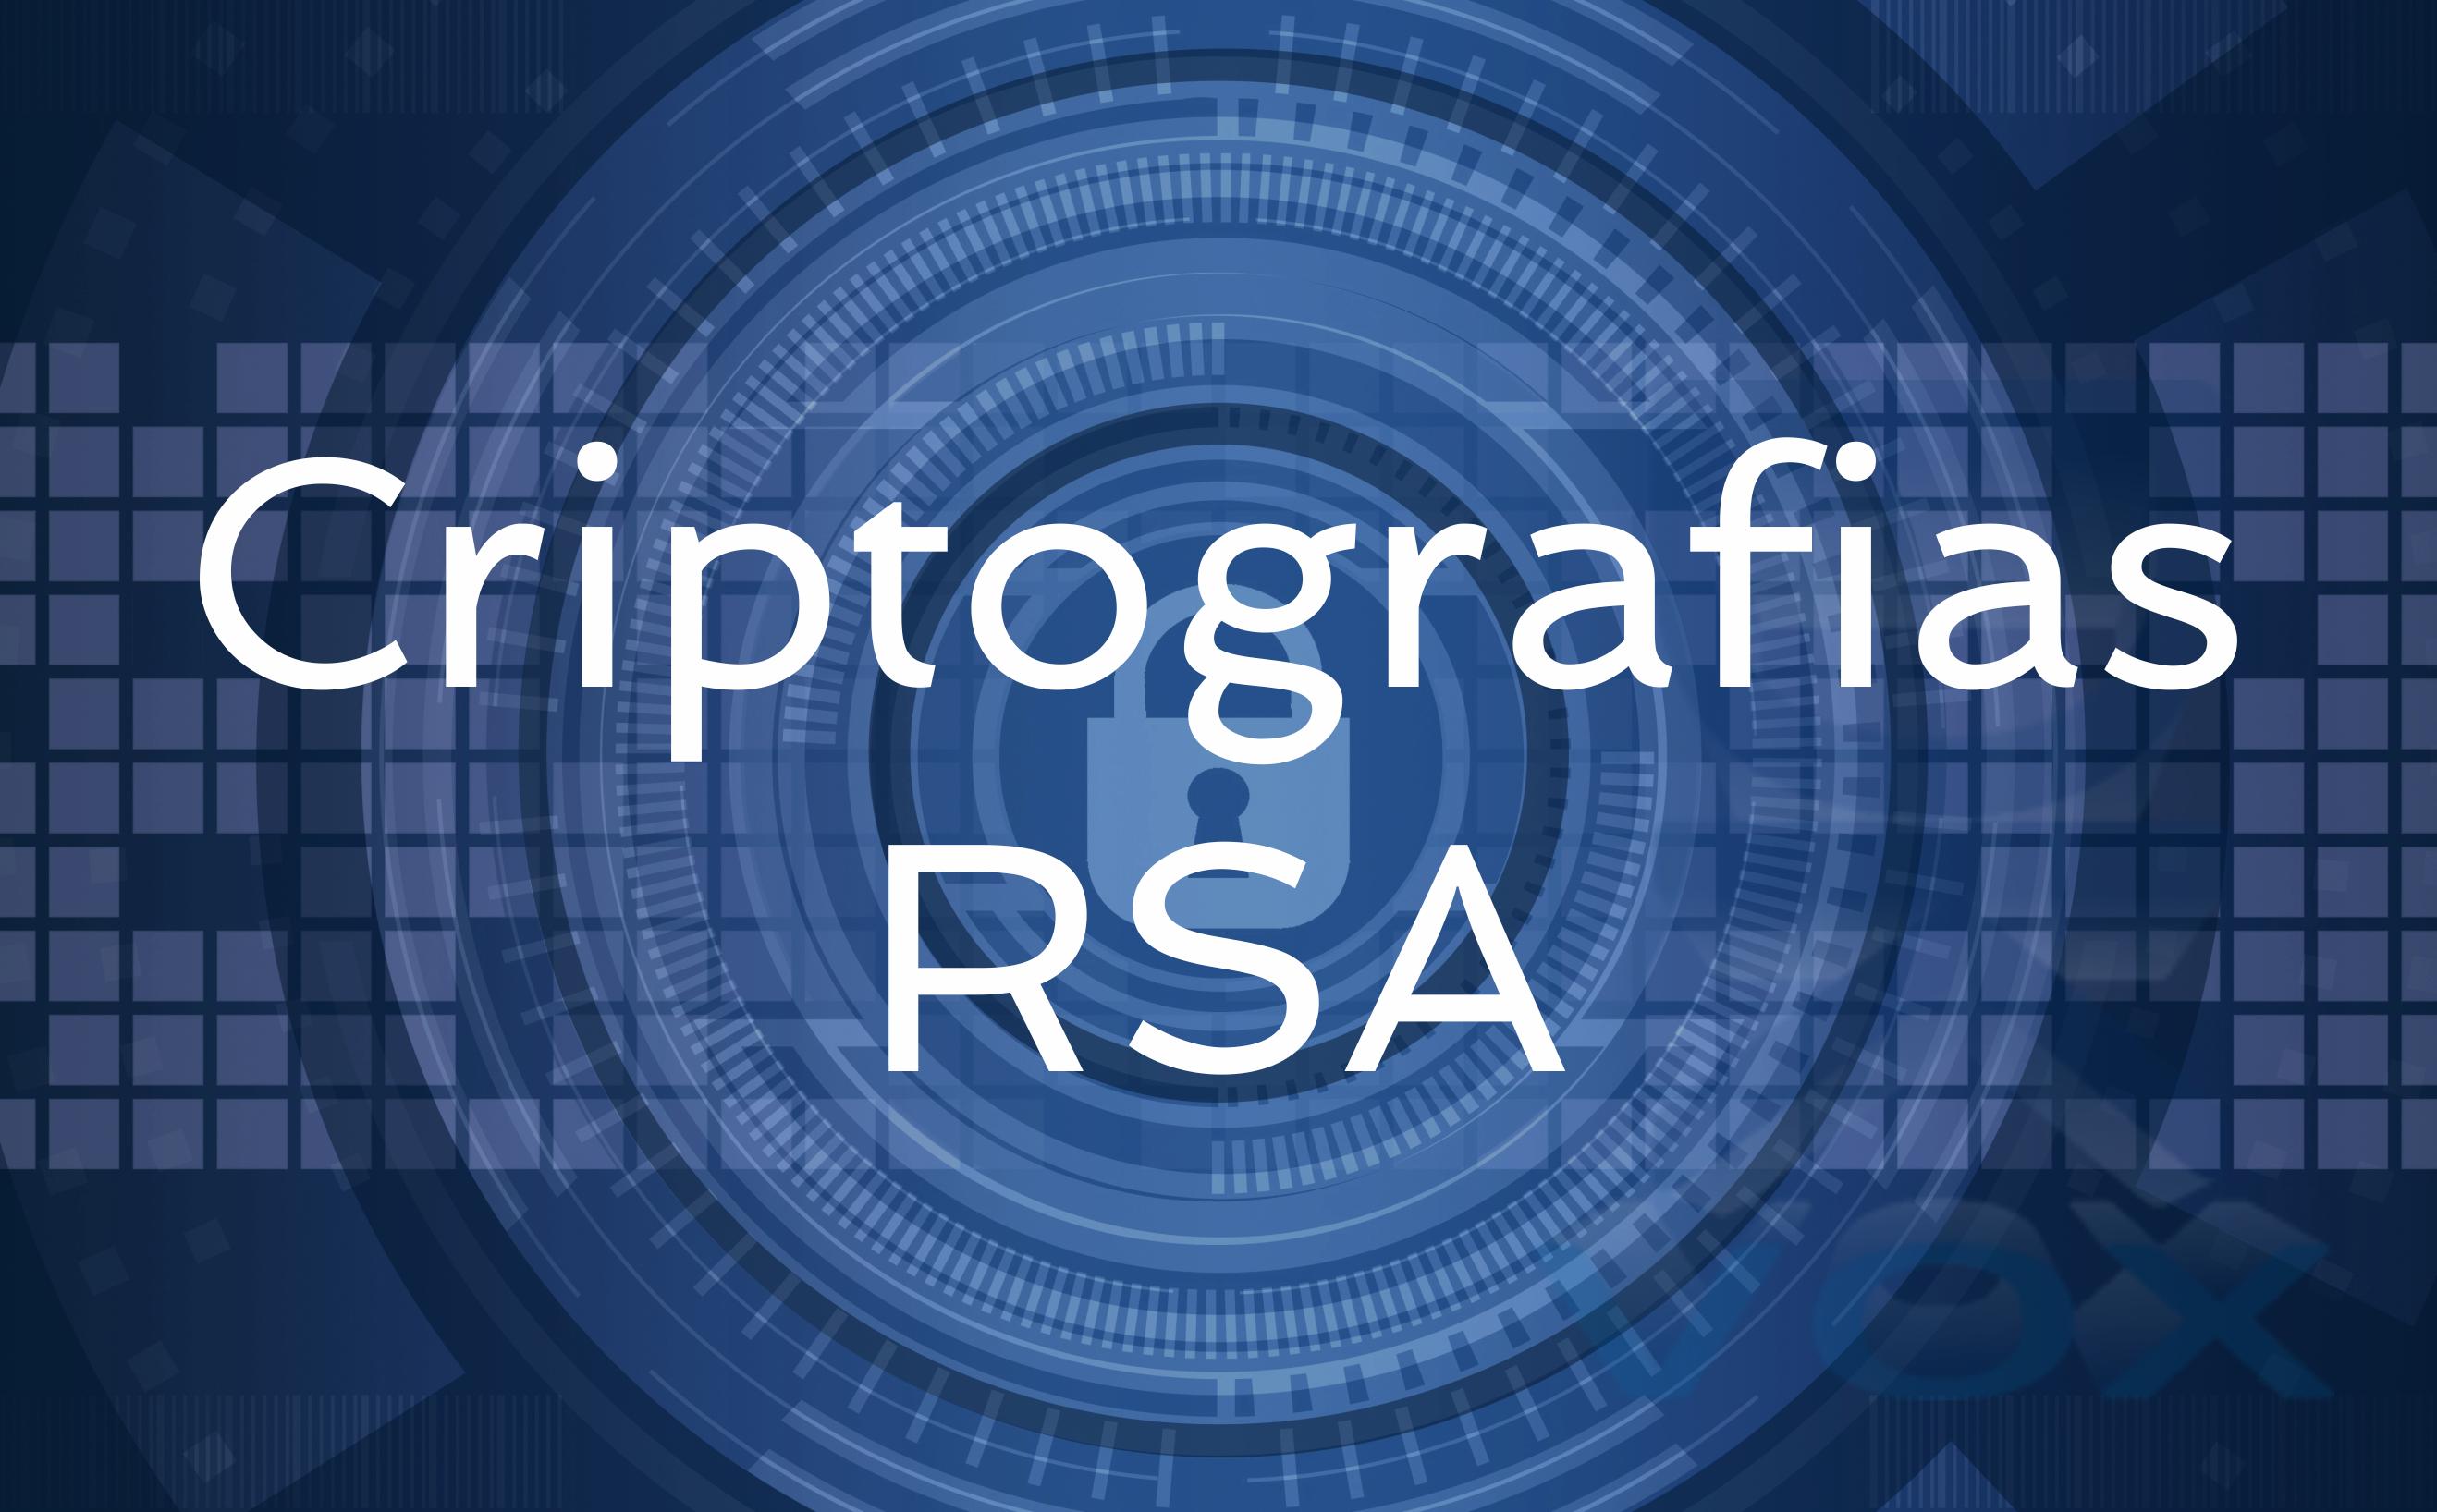 8. Criptografias RSA